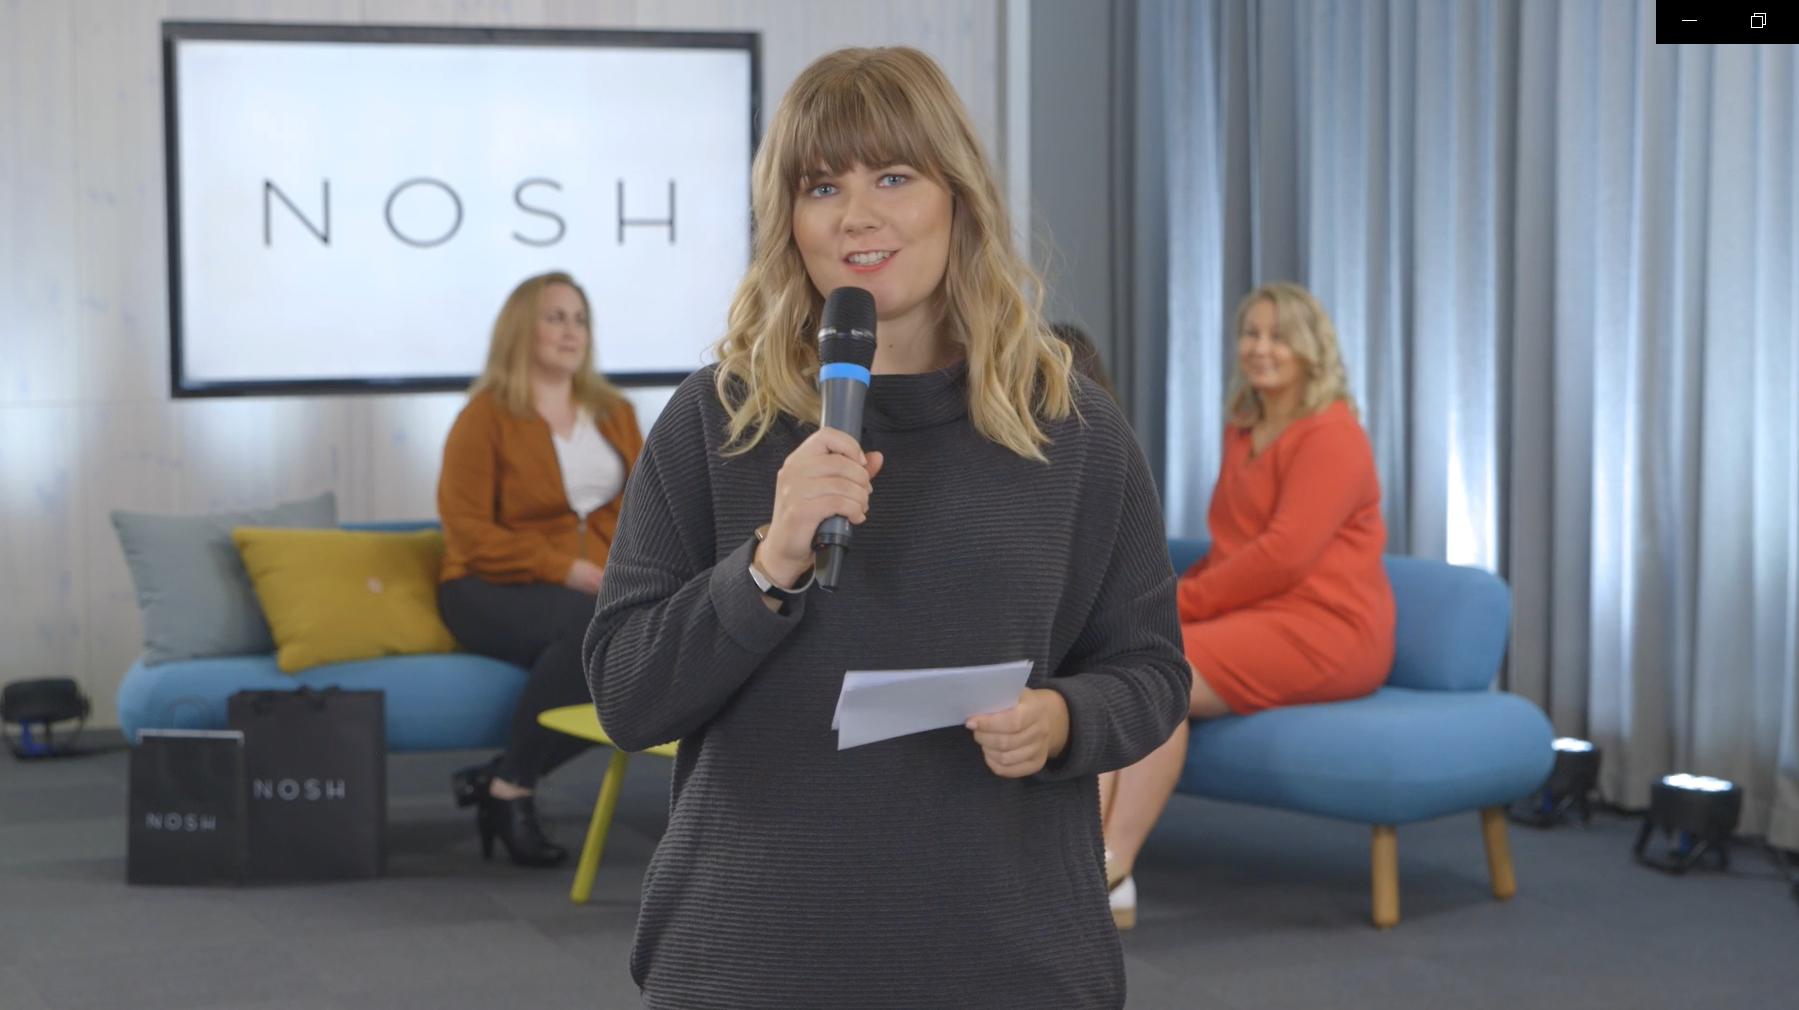 Nosh - virtual event